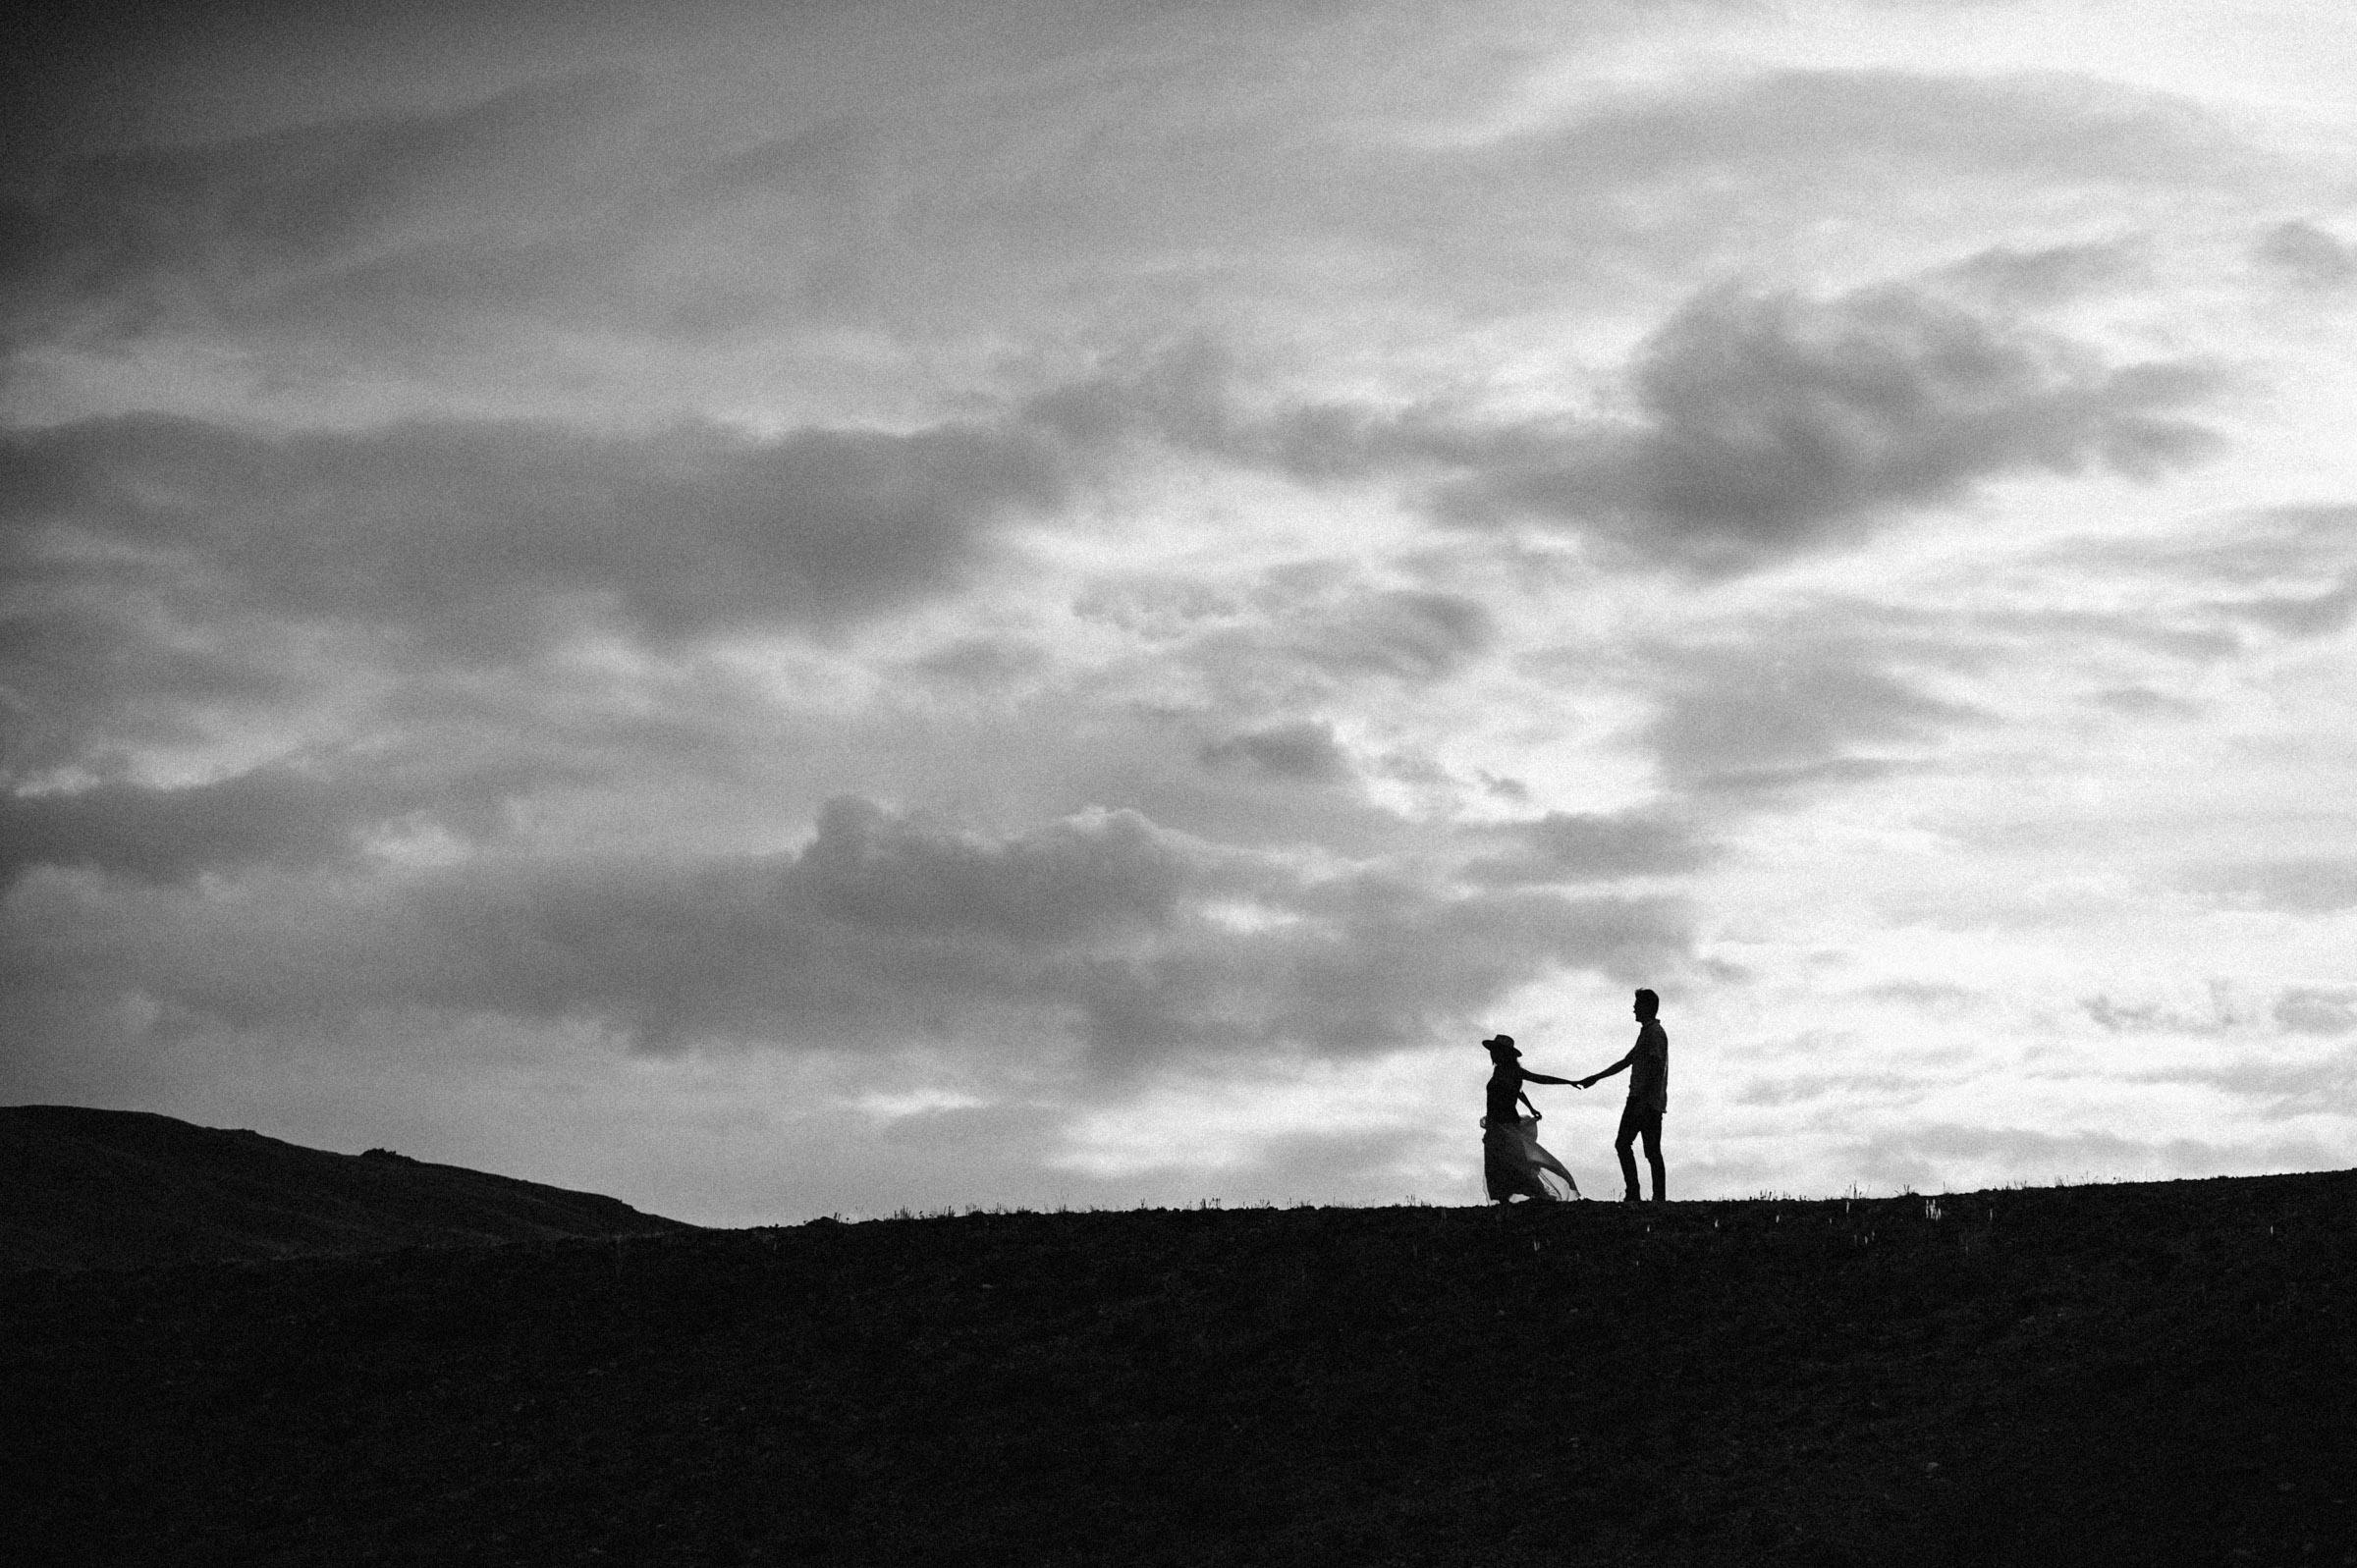 couplesadventurephotographer 2